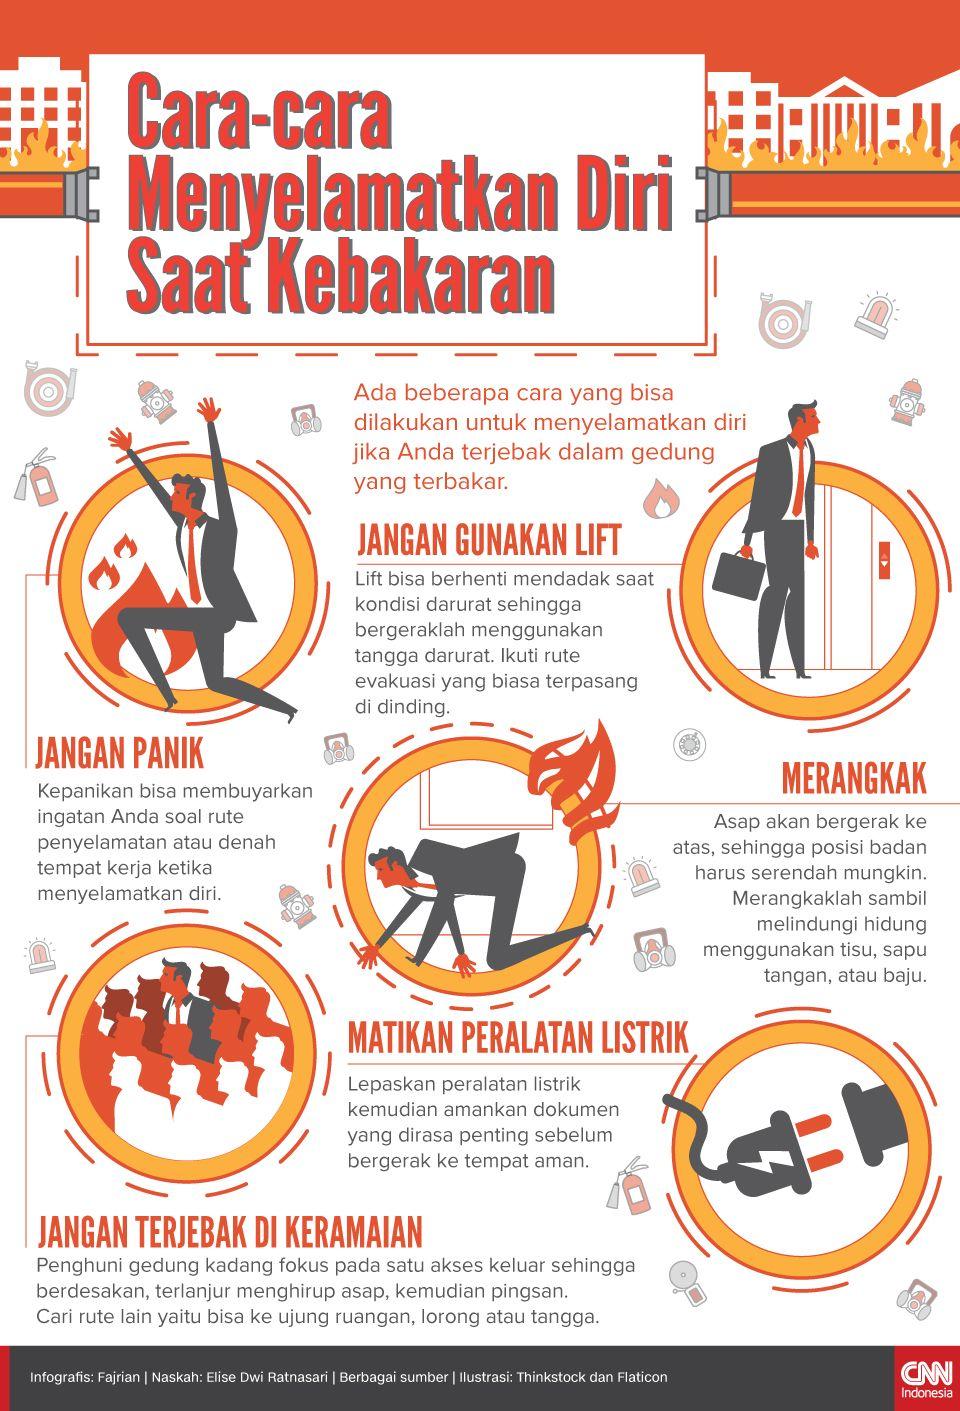 Infografis cara-cara menyelamatkan diri saat kebakaran